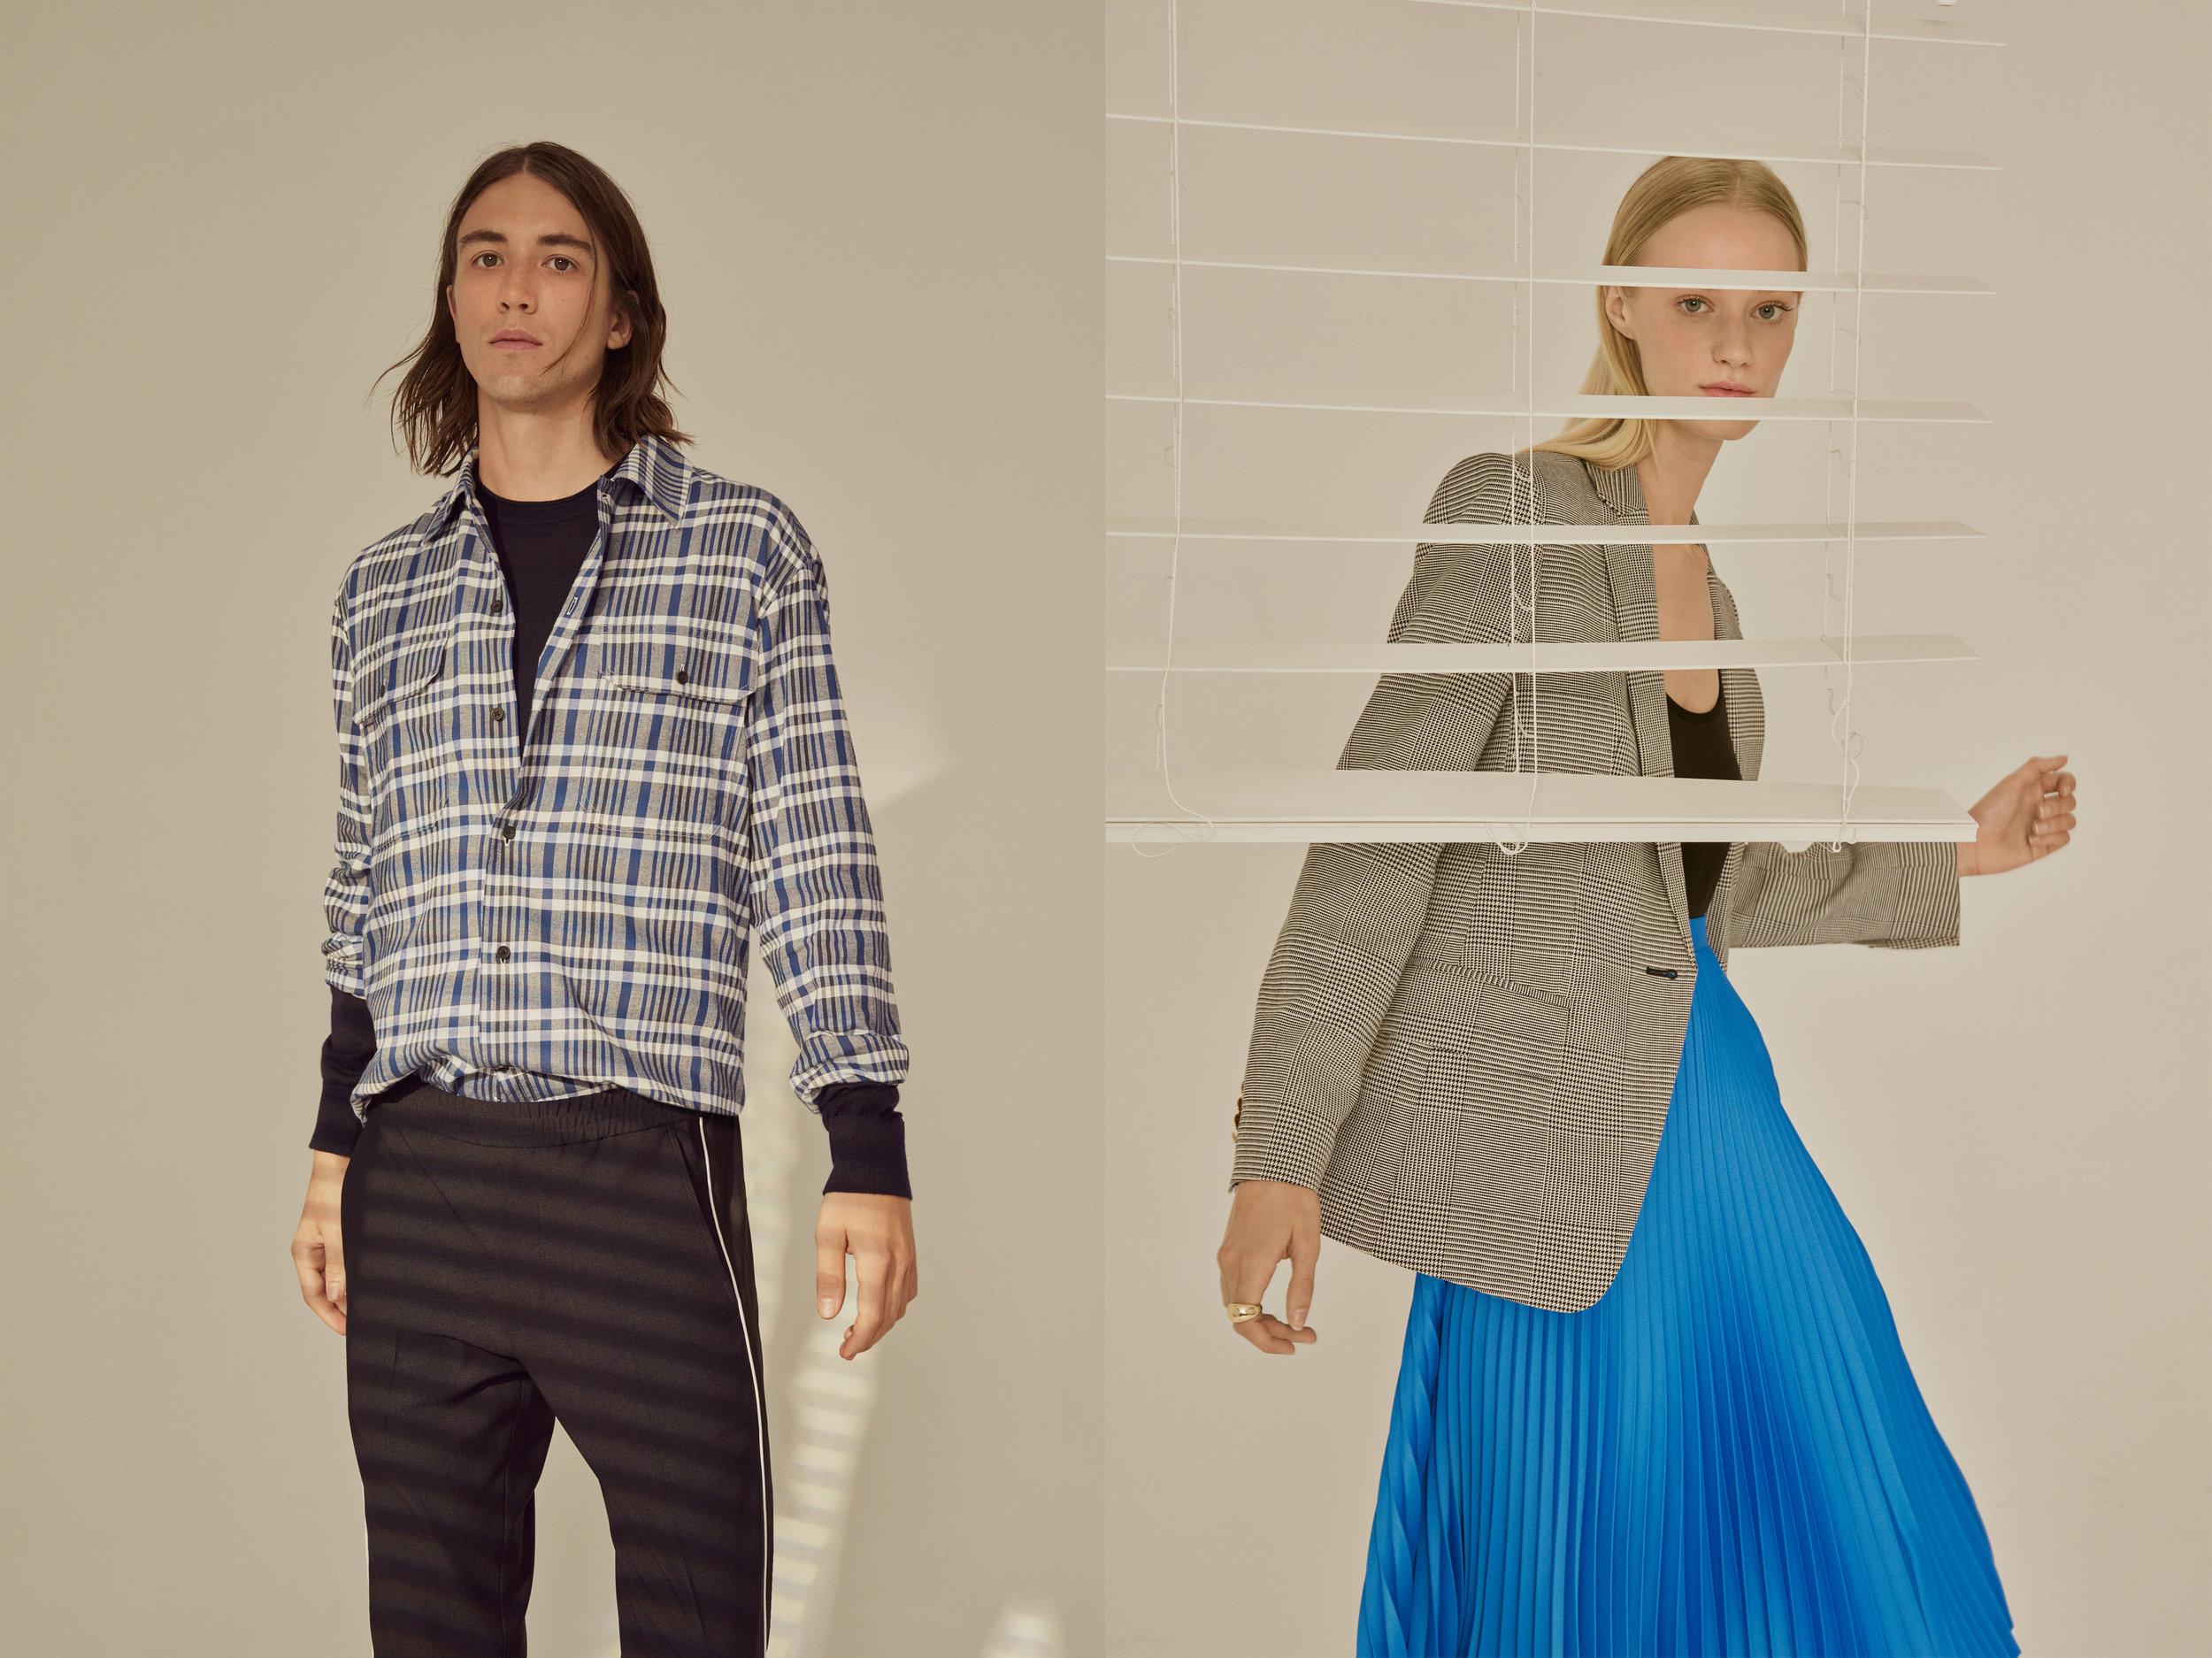 Double Knit Crew, Brushed Plaid Work Shirt, Piped Elastic Pant / Unitard, Borrem Blazer, Annina Skirt